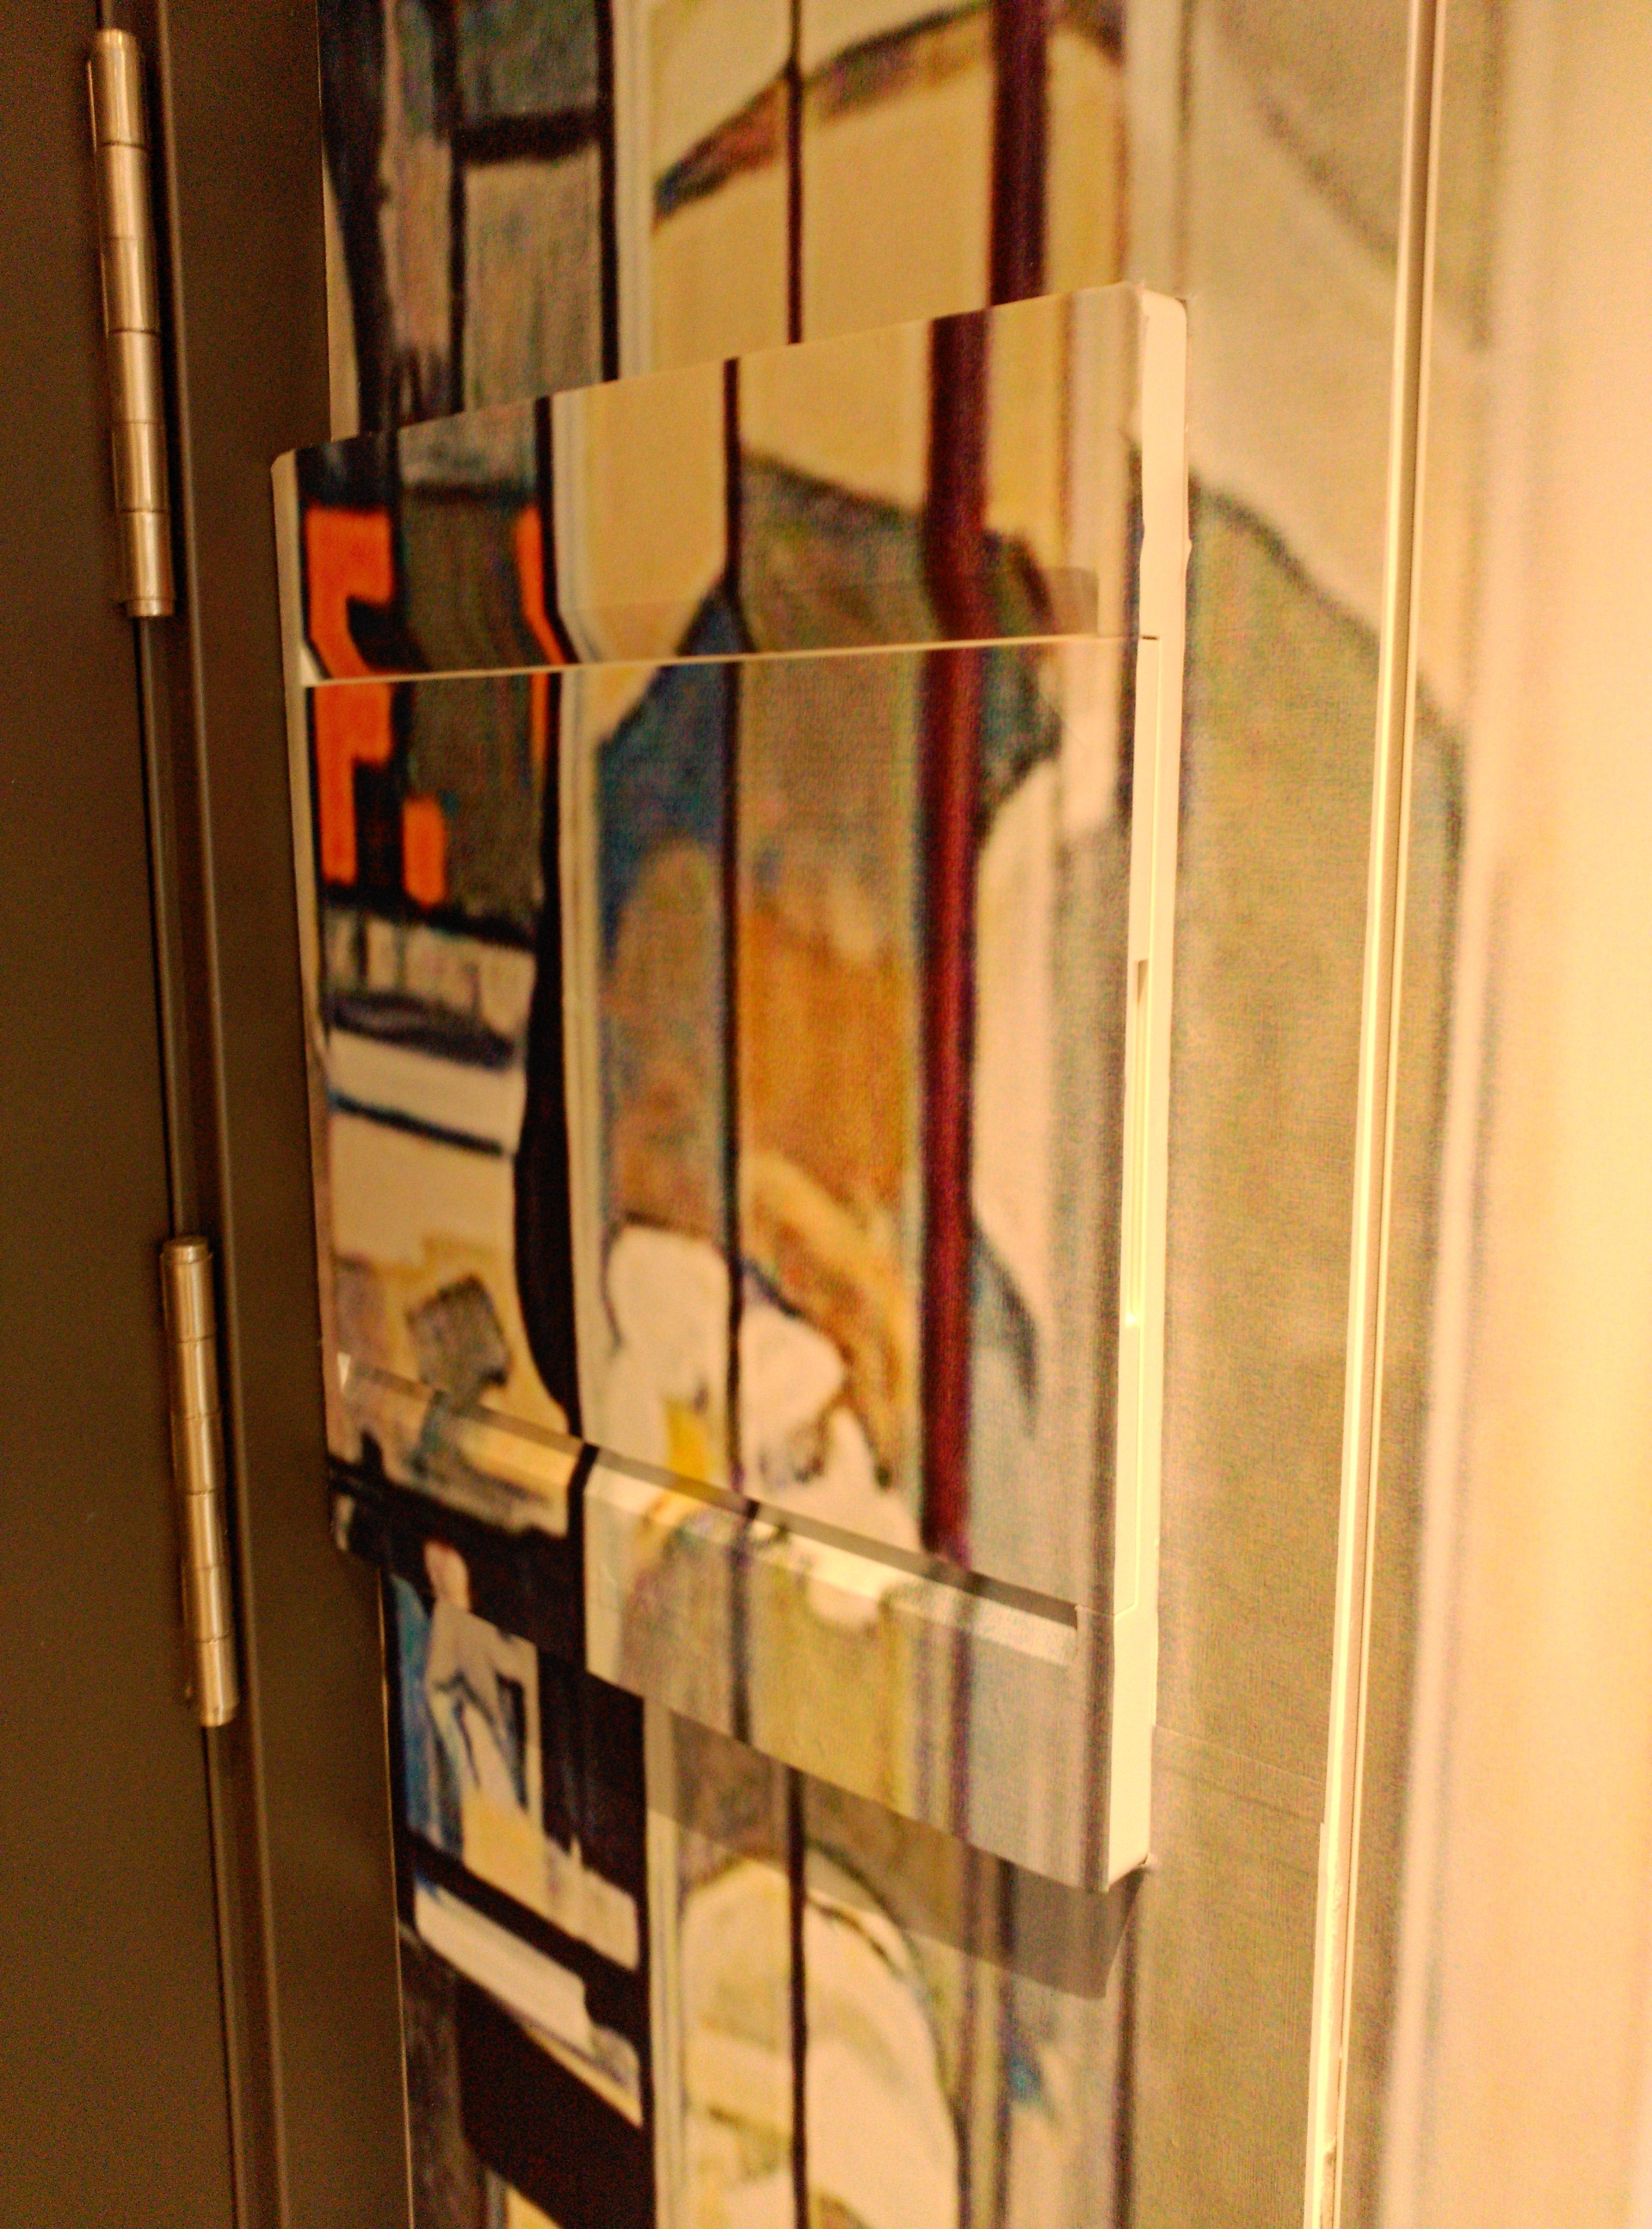 armario_mural_RichardEstes_cabinas_teléfono_decoración_interior_estella_Navarra_IMPRESIÓN_DISEÑO_VINILOS_ROTULACIÓN